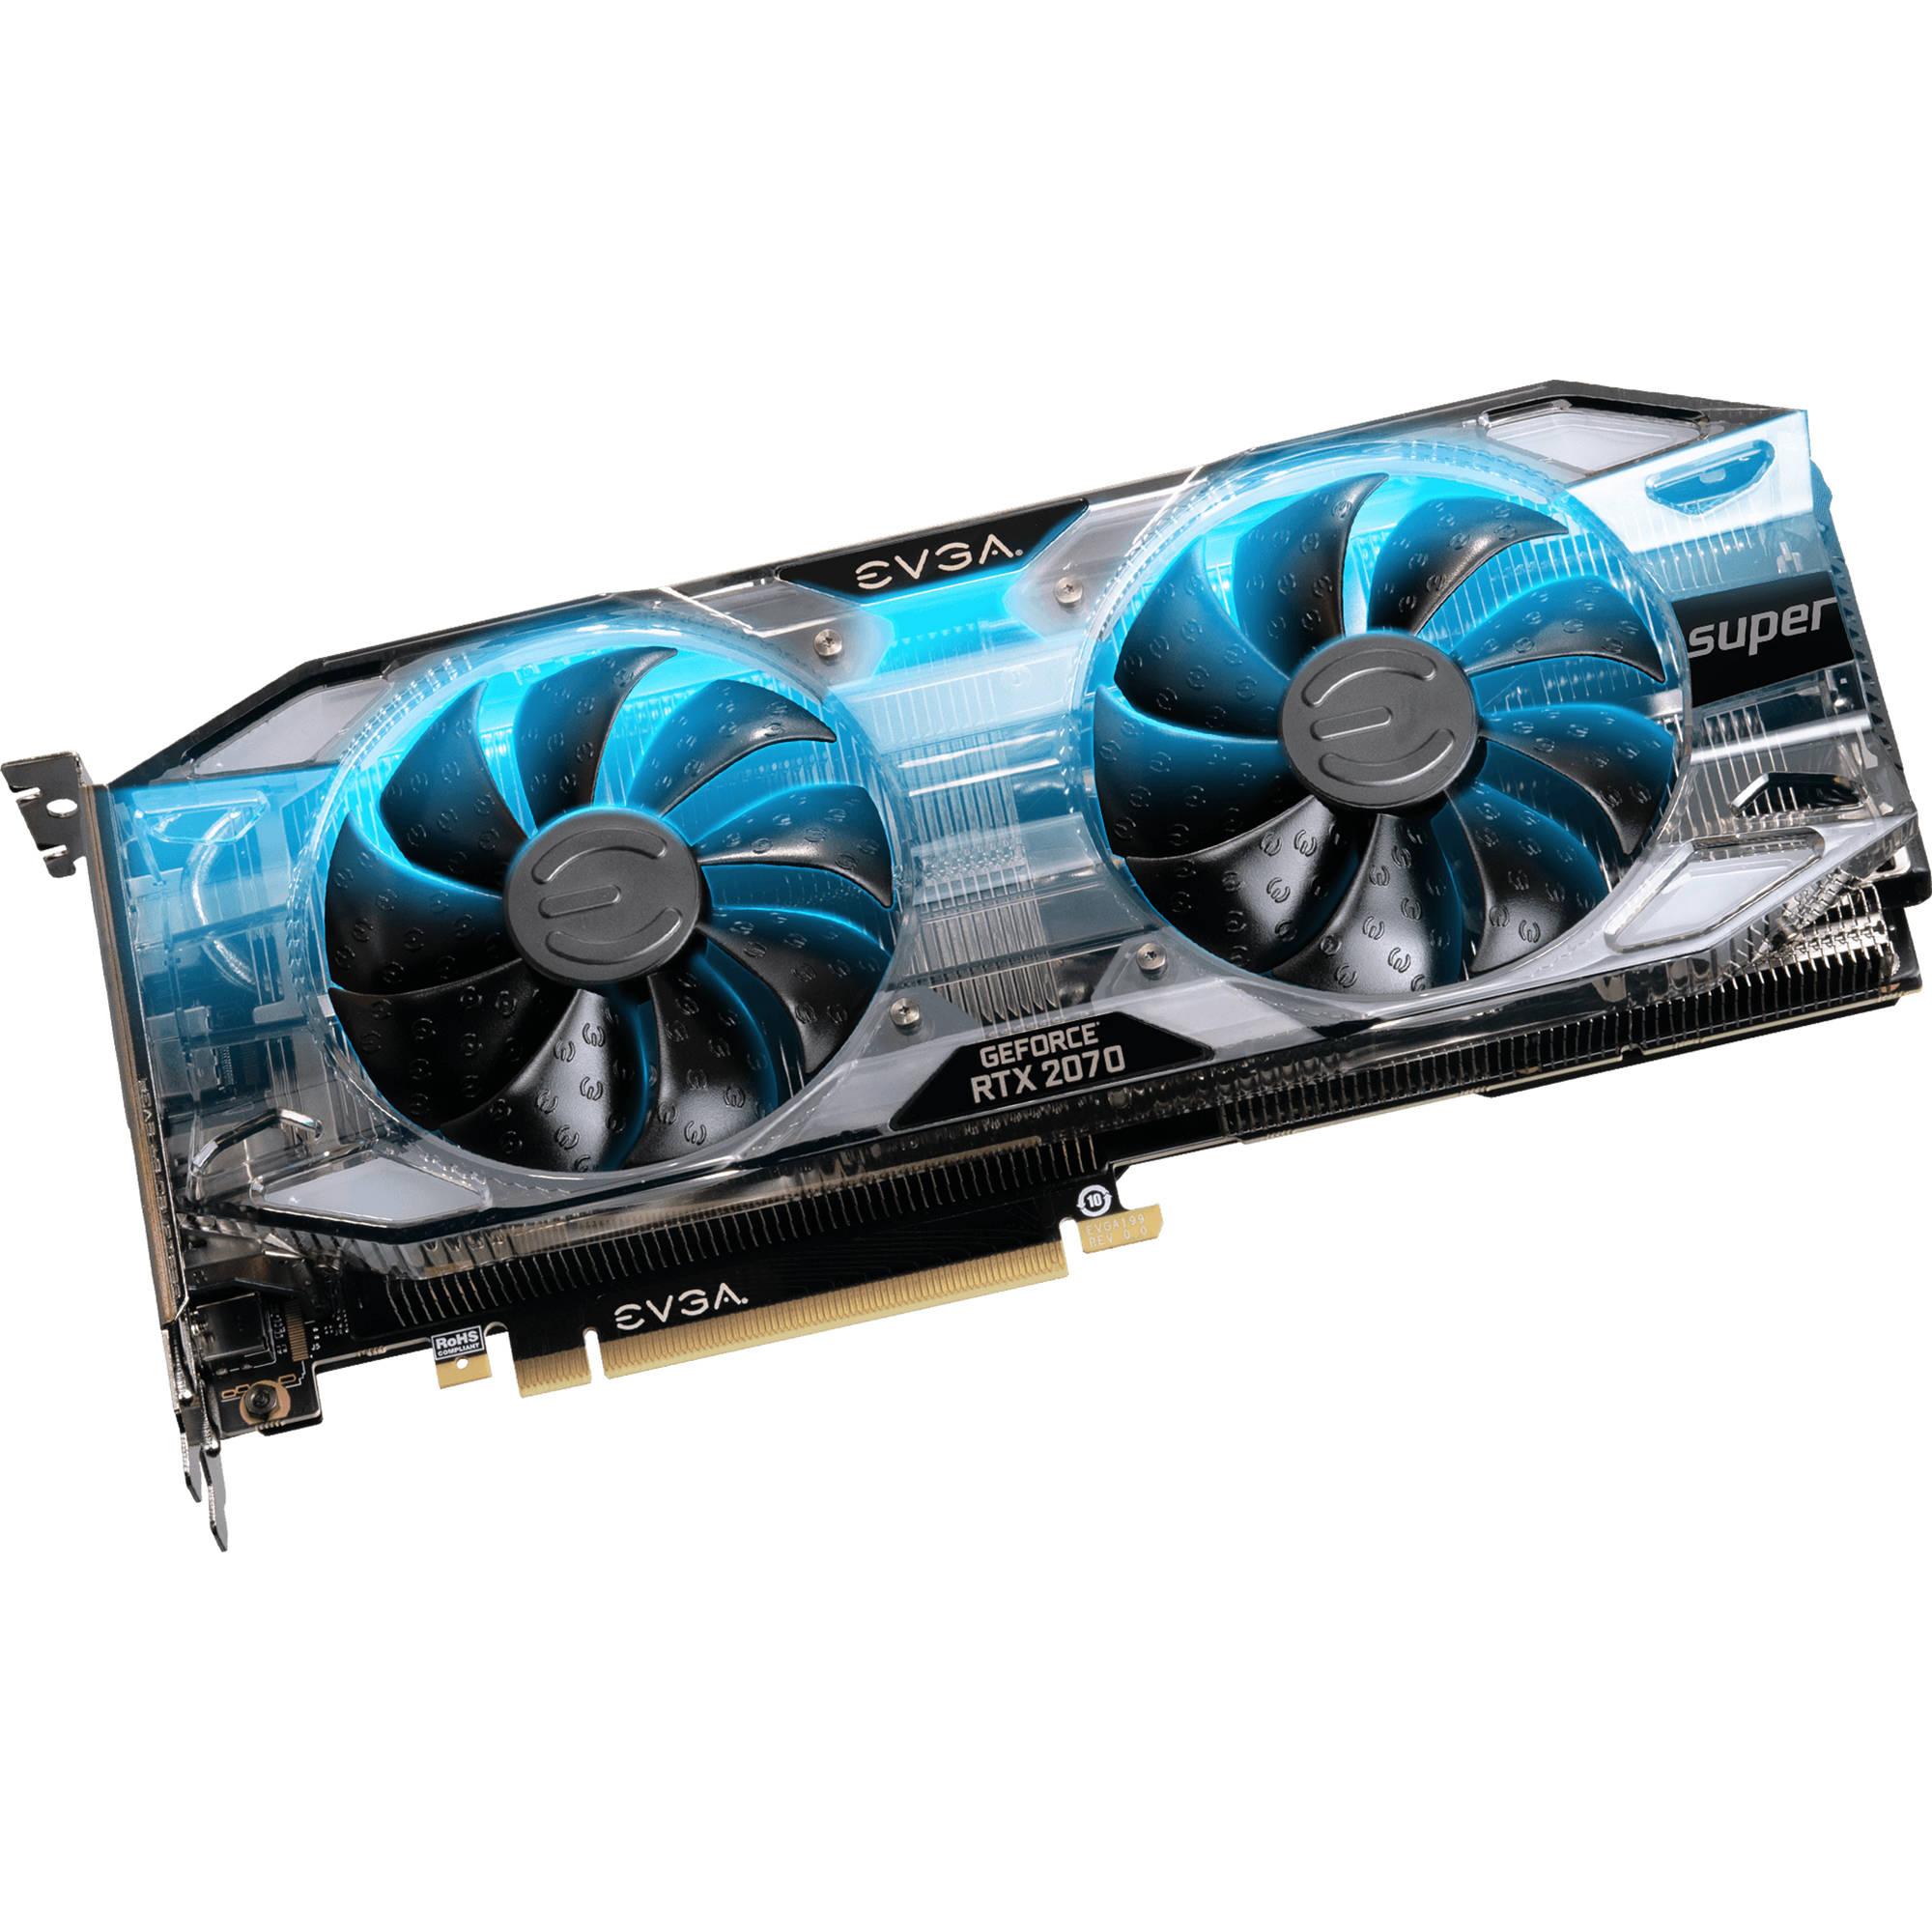 9576124c5f5 EVGA GeForce RTX 2070 SUPER XC GAMING Graphics Card